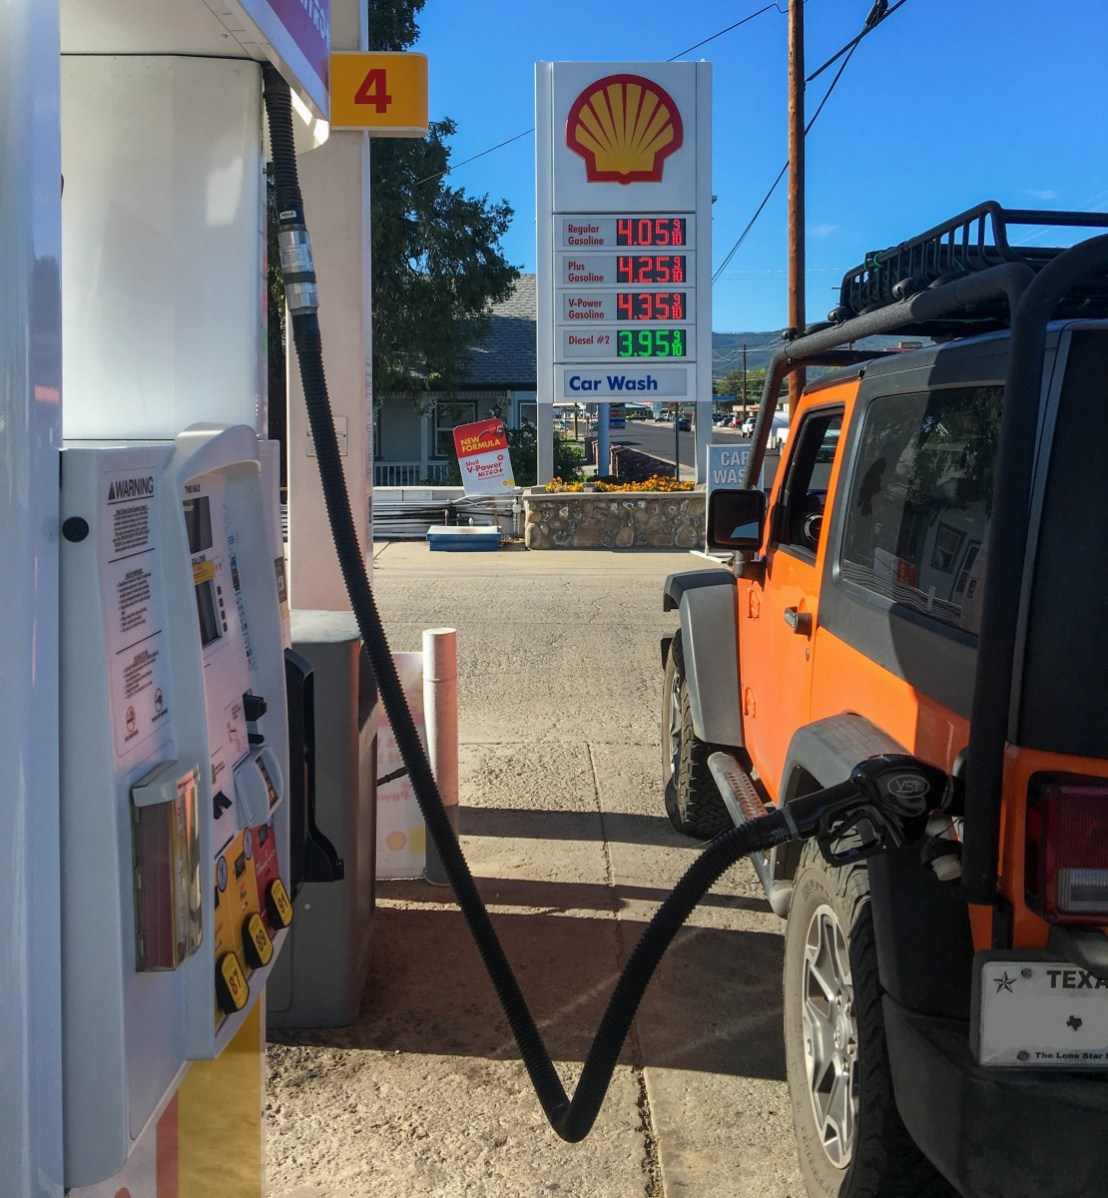 California High Fuel Prices